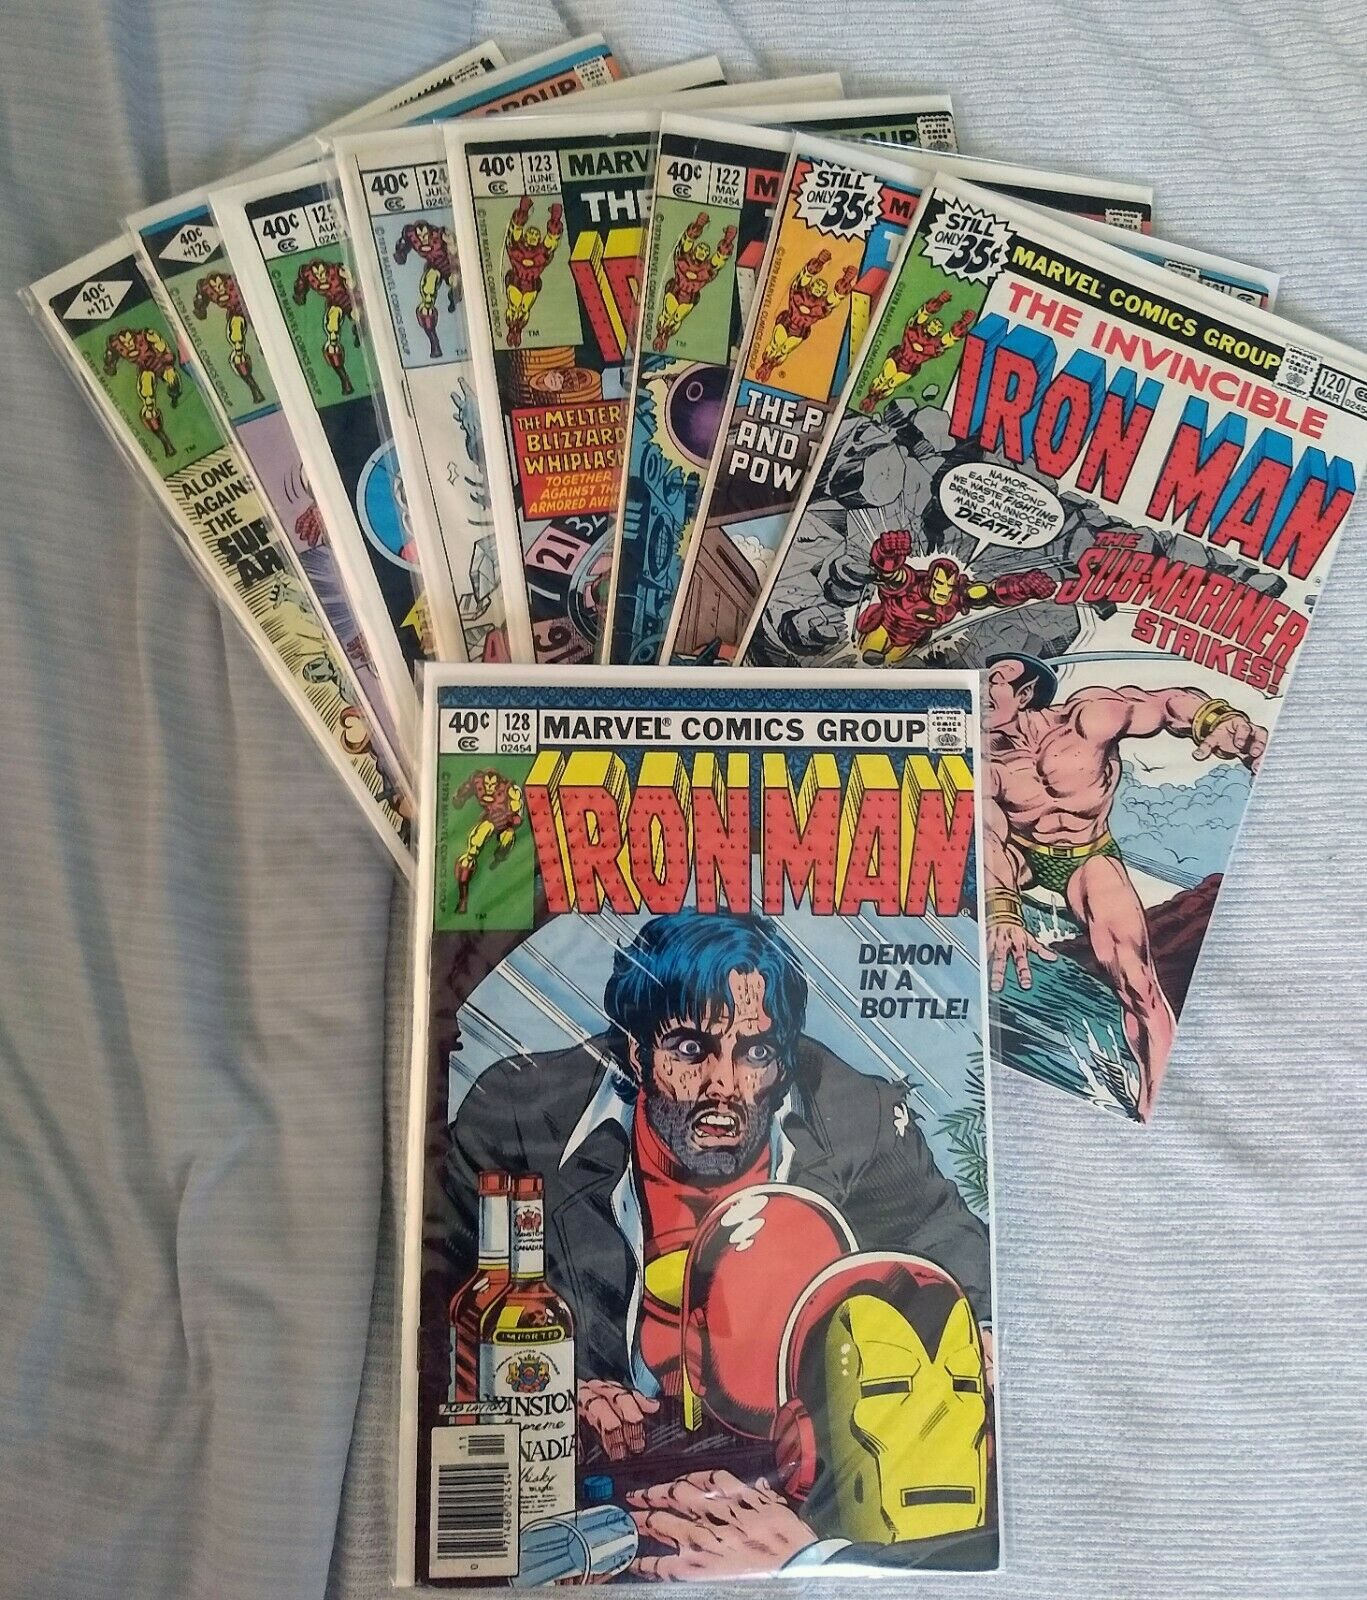 Lot 9 IRON MAN COMICS #120, 121, 122, 123, 124, 125, 126, 127, 128 DEMON BOTTLE